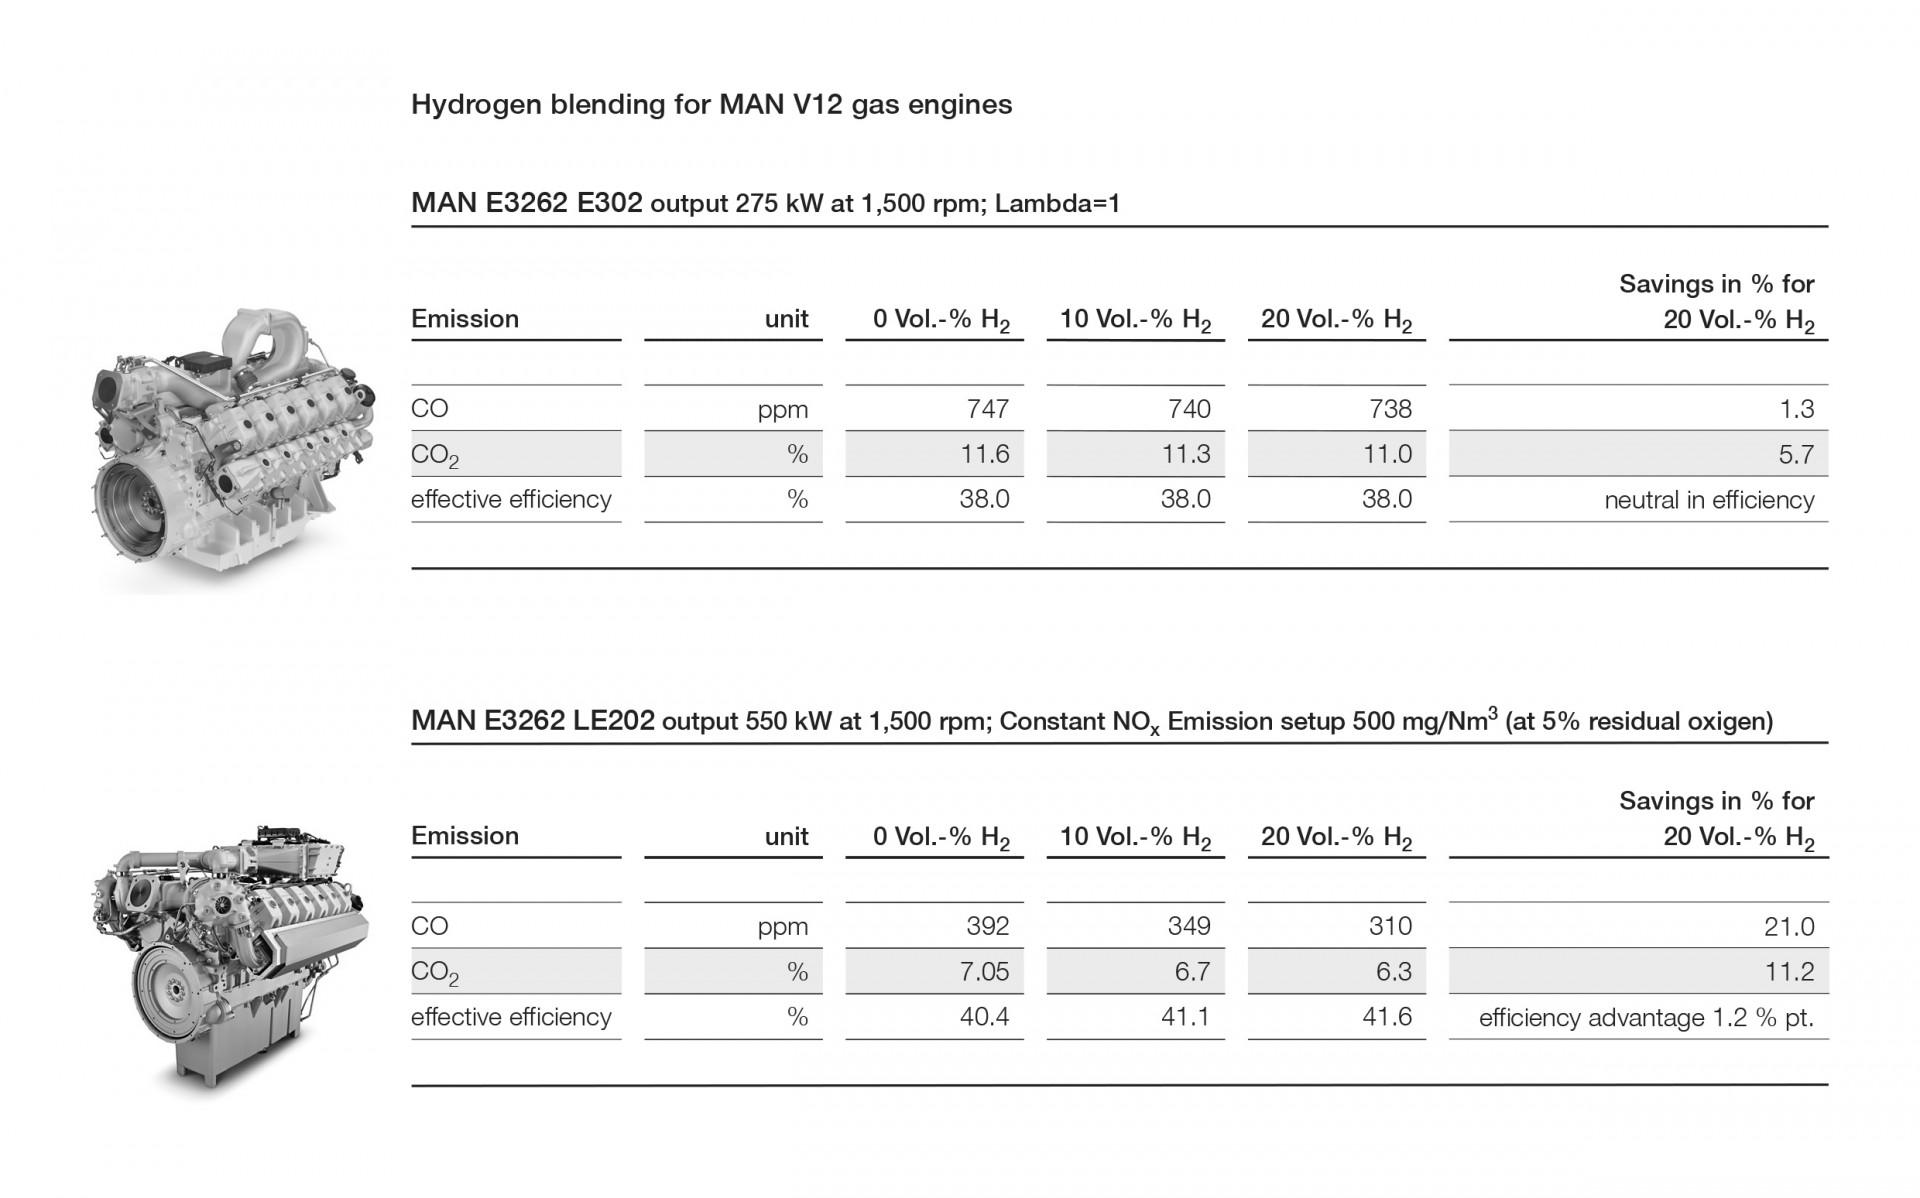 1920_manengines-hydrogenblending-e3262.jpg